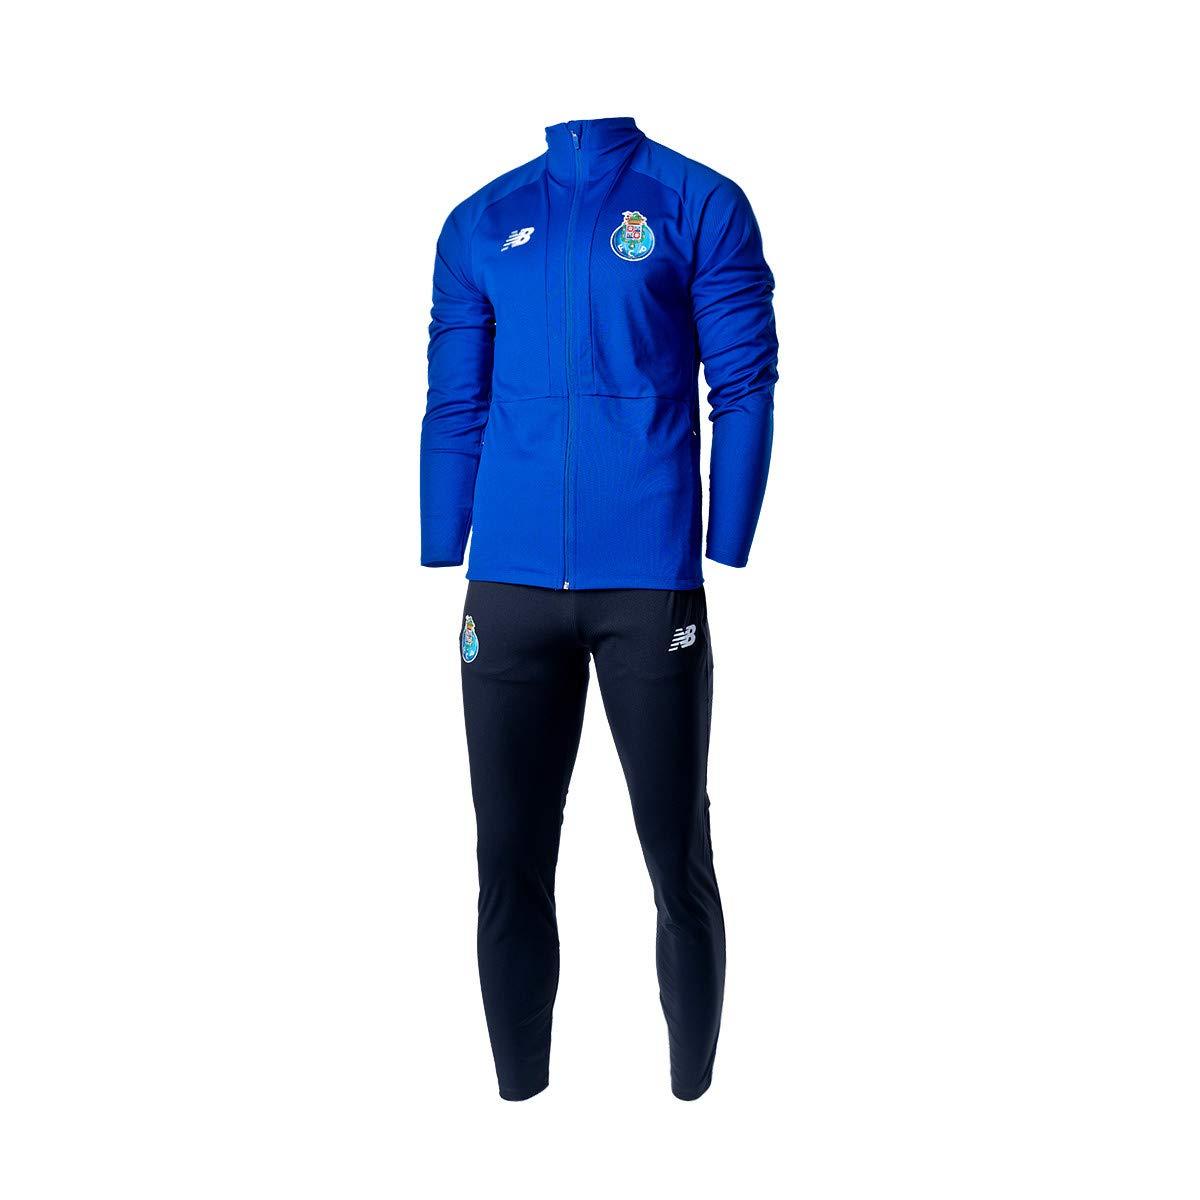 New Balance FC Porto Paseo 2019-2020, Chándal, Azul, Talla XL ...